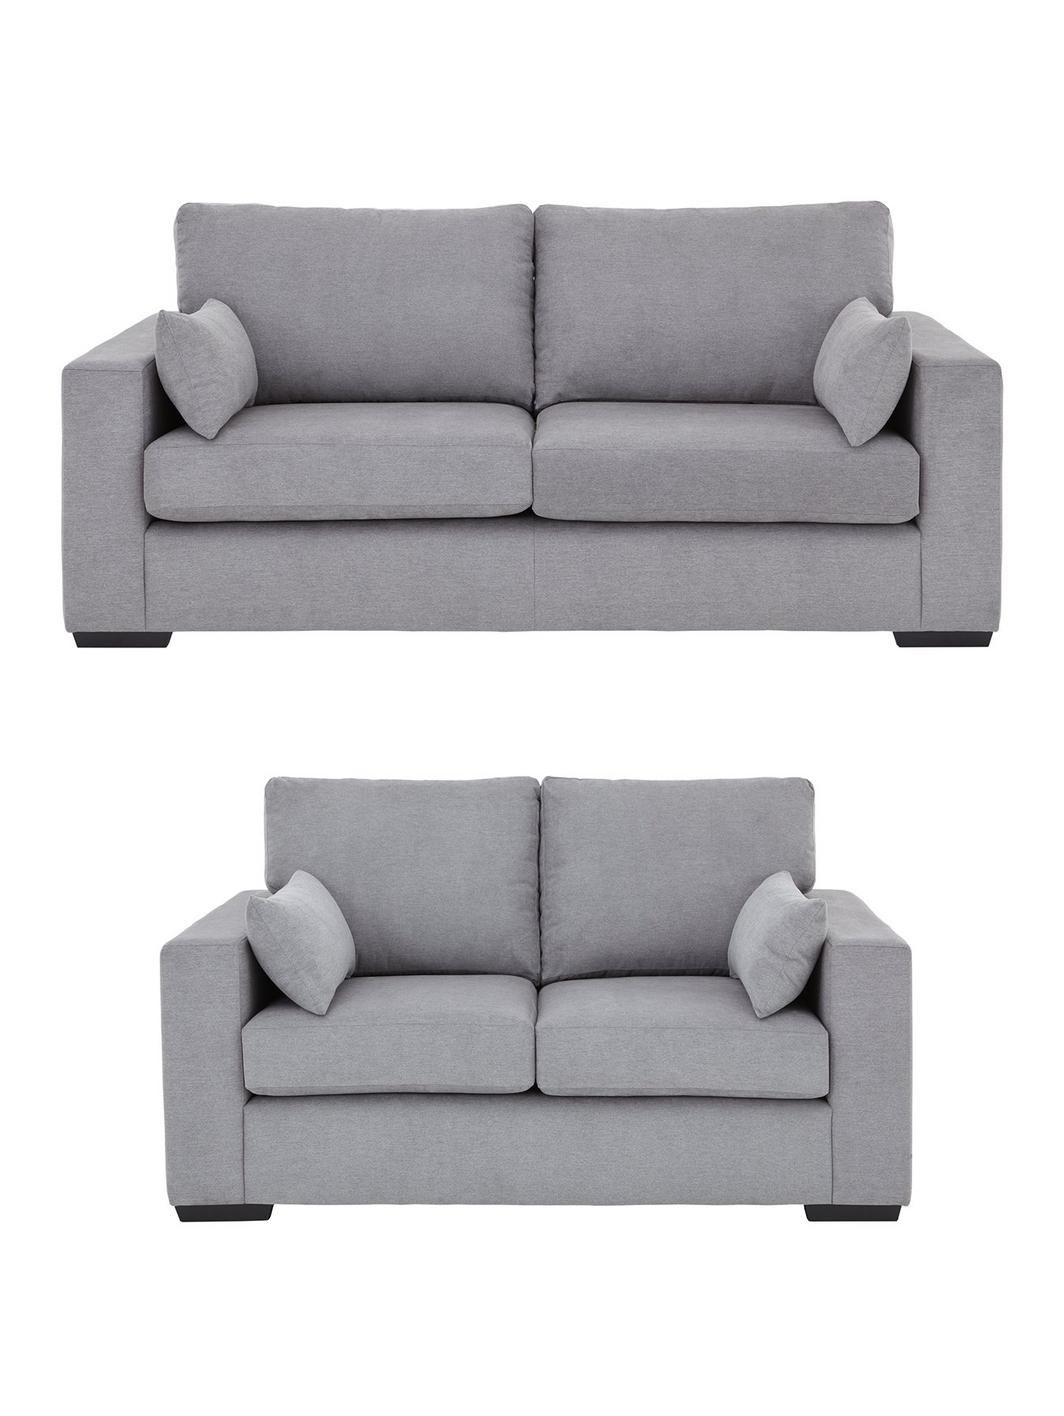 Zanzio 3 Seater 2 Fabric Sofa Set And Save